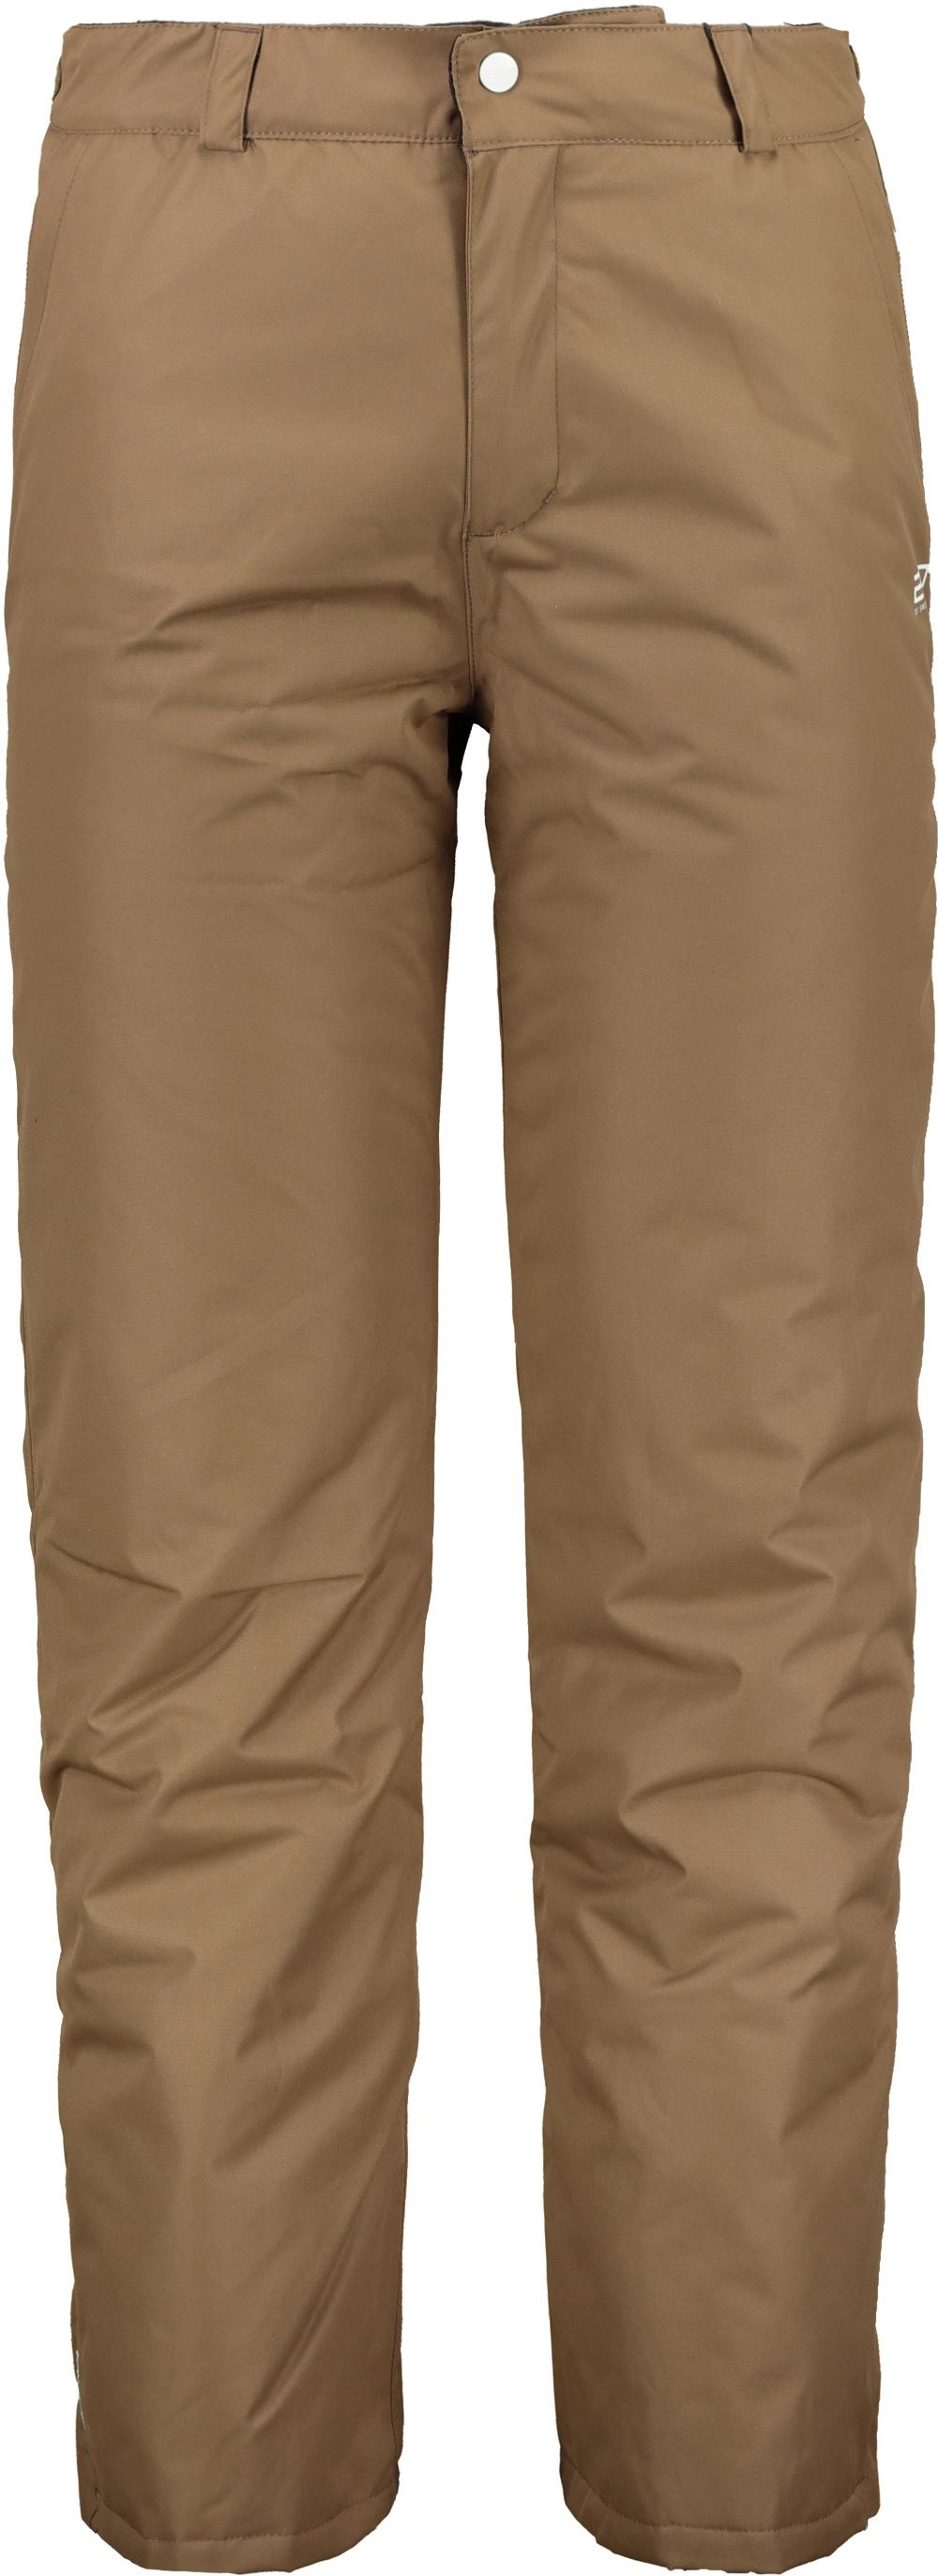 Kalhoty lyžařské pánské 2117 TÄLLBERG